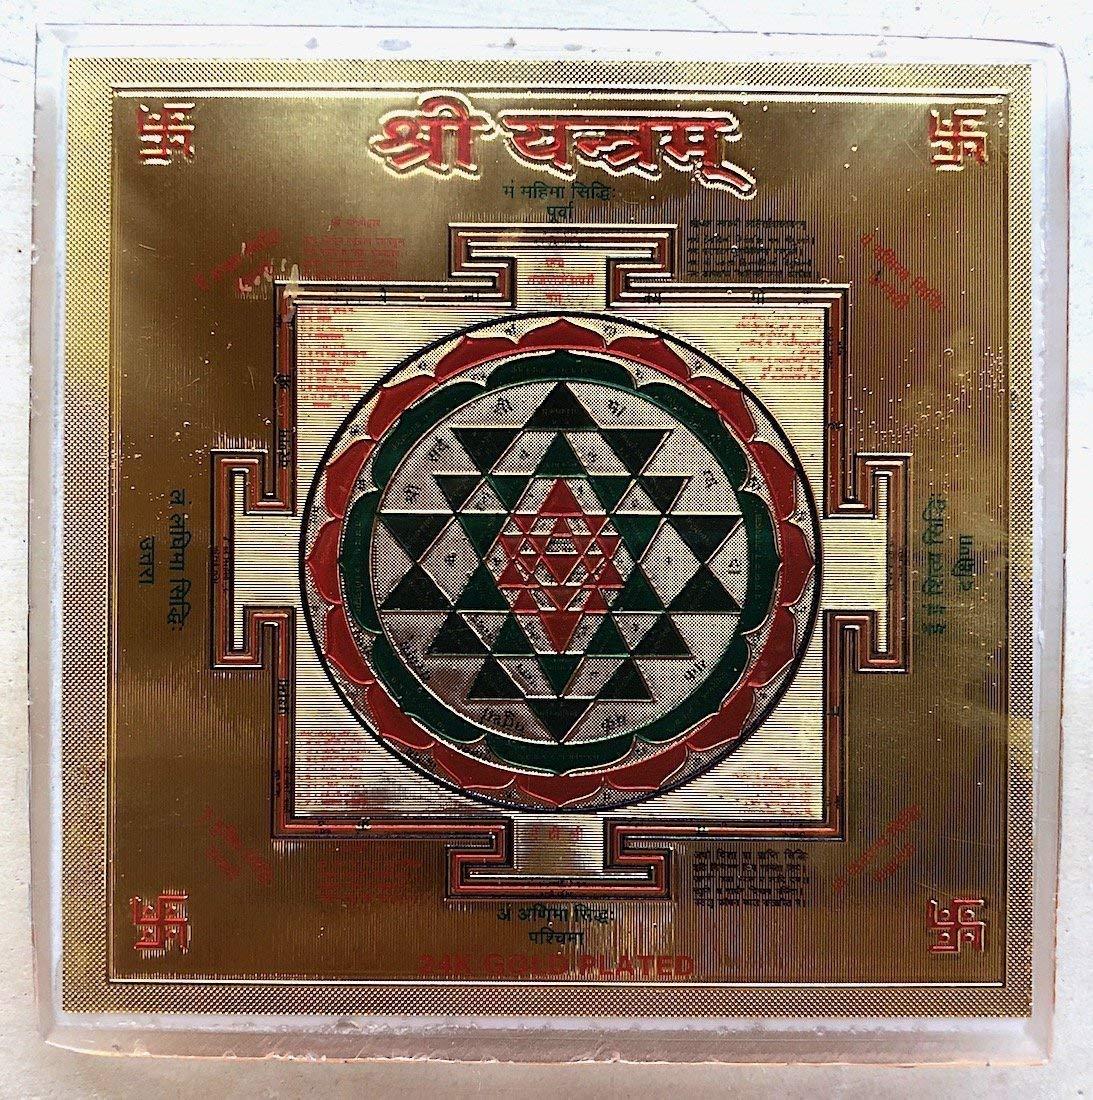 Framed Sri Yantra Yantram shri yantra kavach 4x4 Inches w/stand - Energized yantra High Quality Embossed Printing w/Golden accents on 180/190 GSM Hybrid Foil Paper Wealth Abundance - US Seller